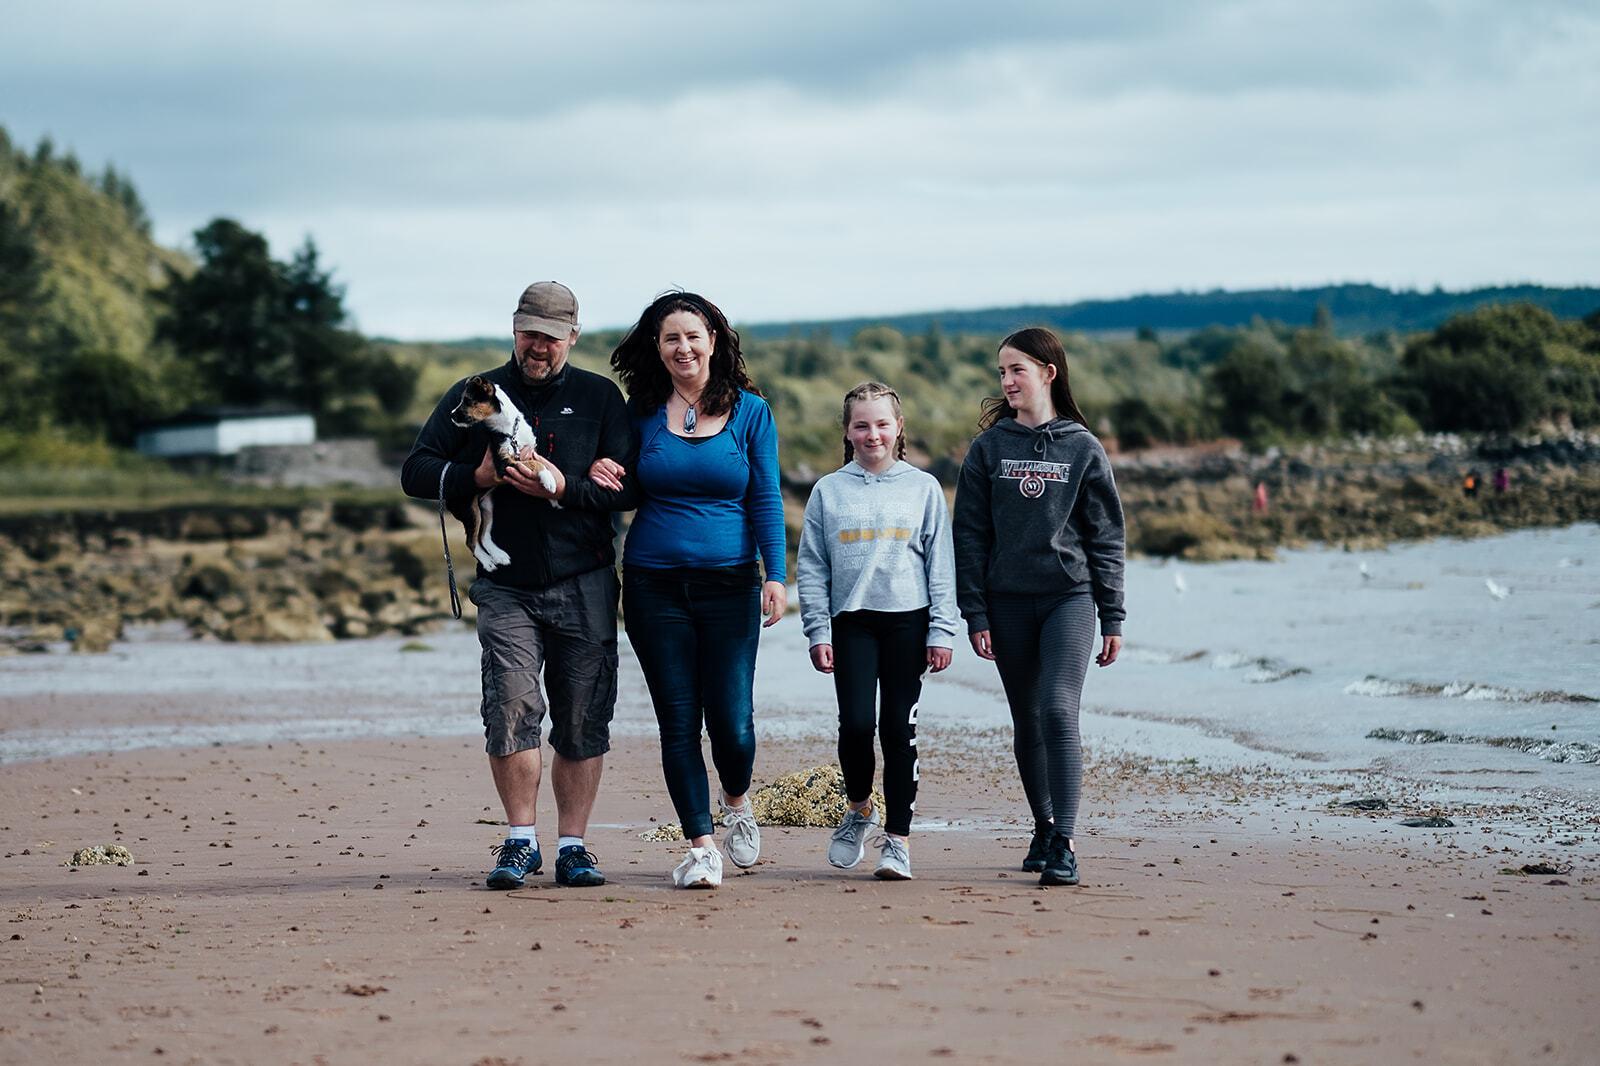 Jenni - Humans of the Walk